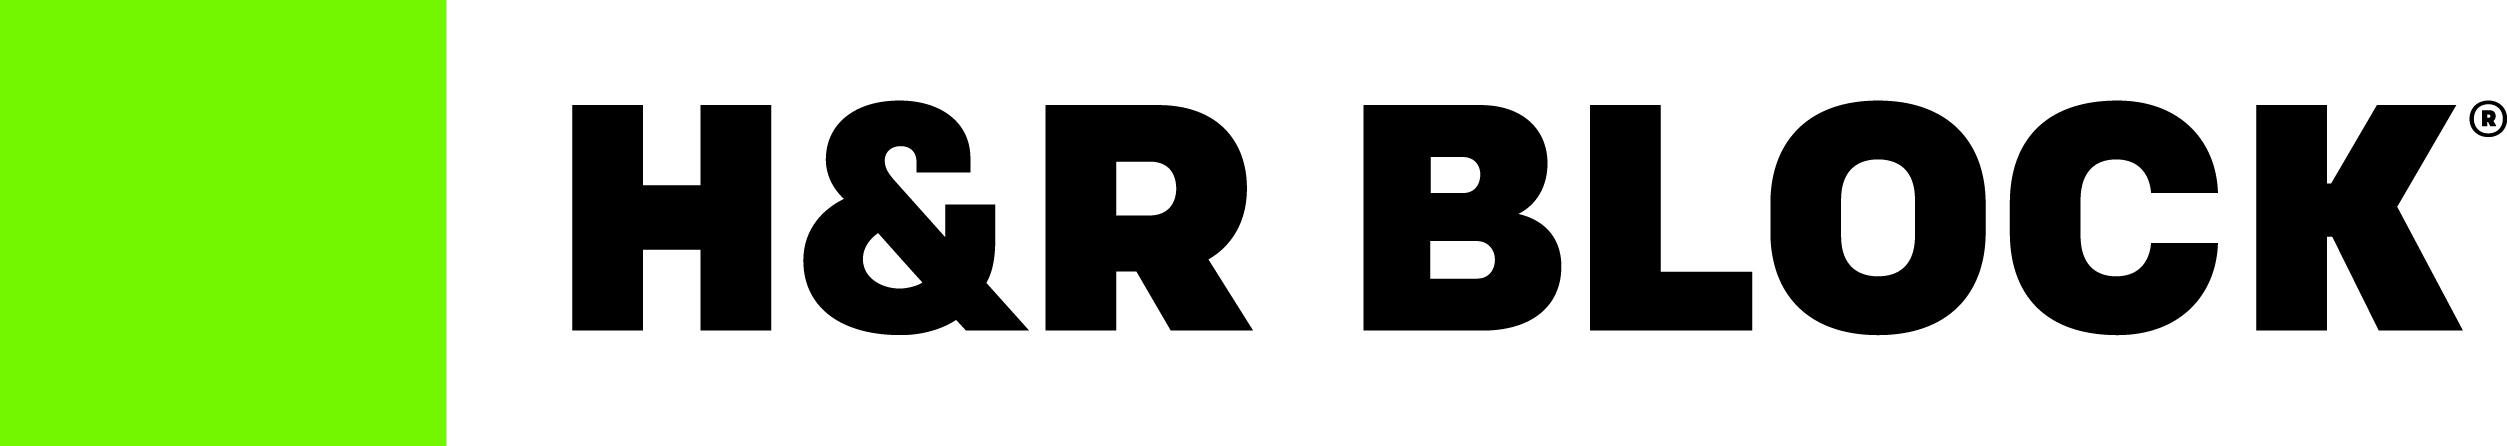 HRB horizonal logo